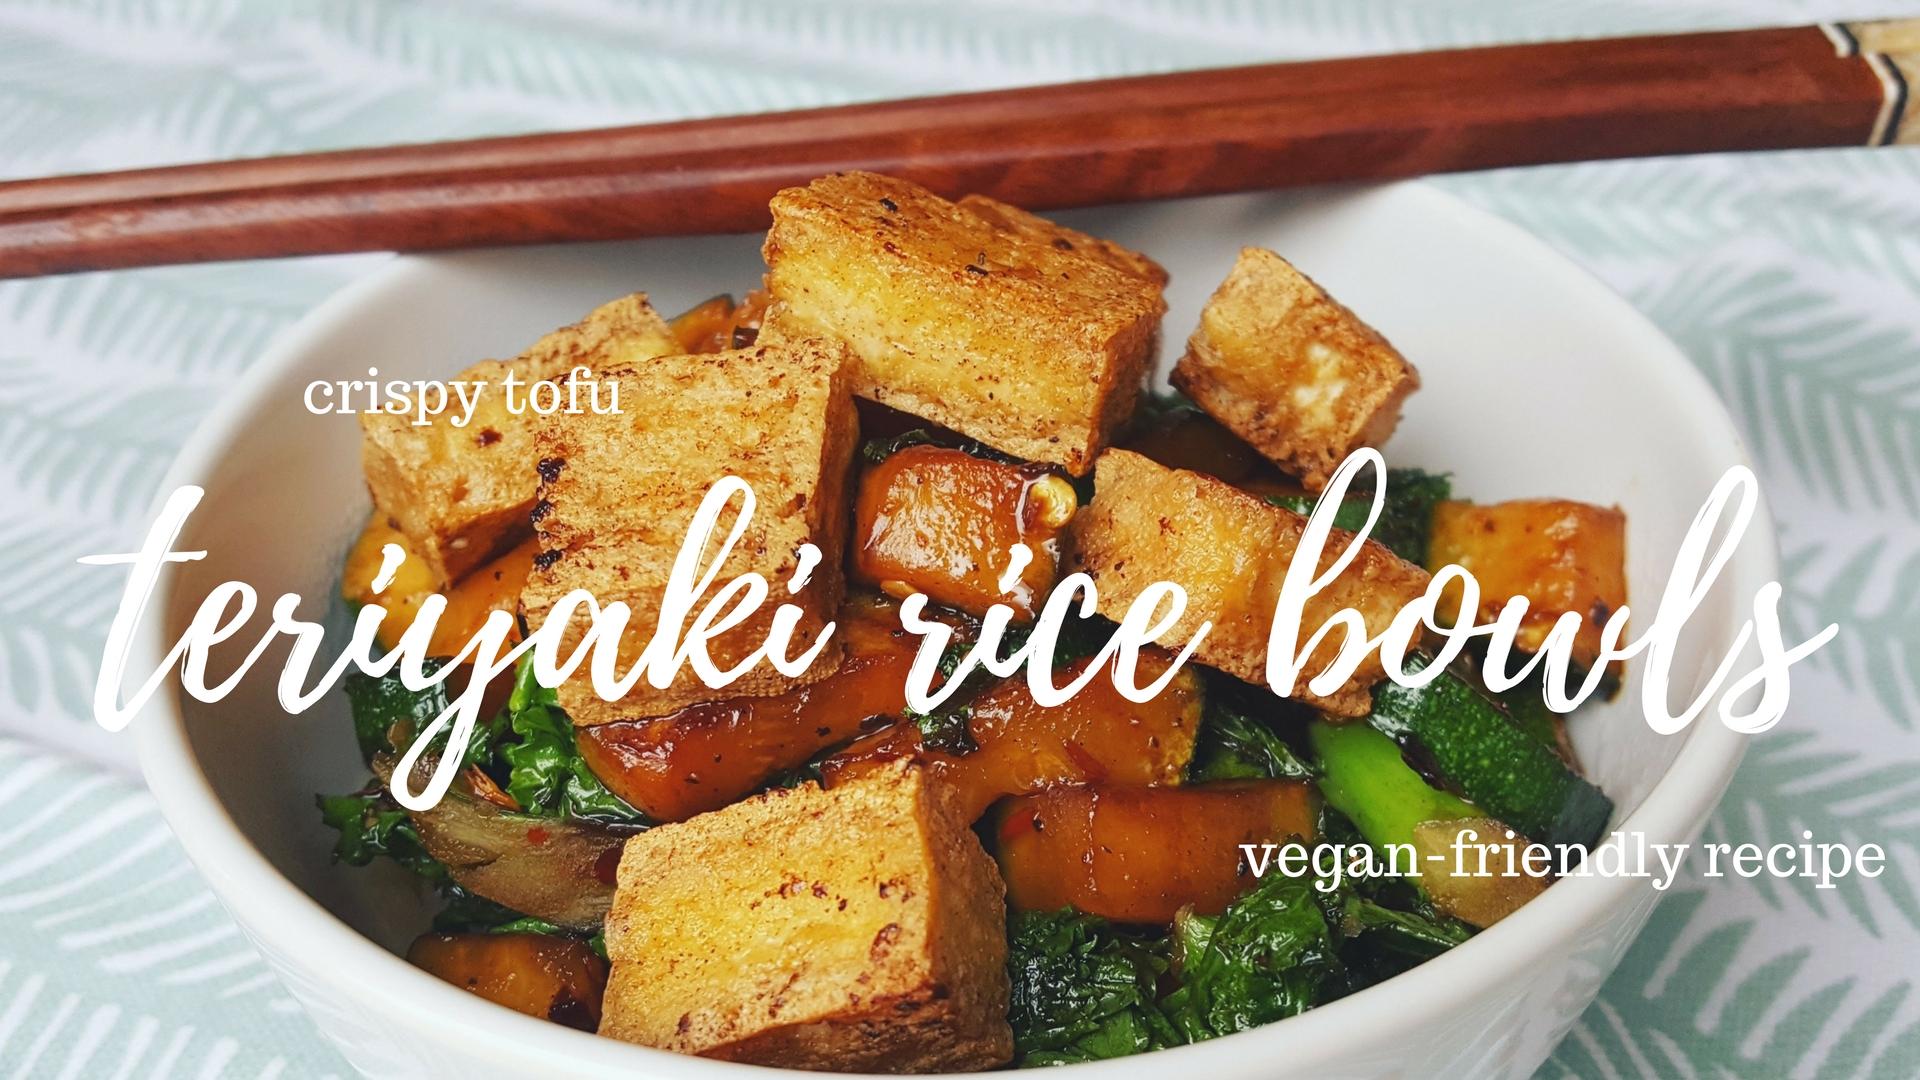 food blogger Manchester: vegan ice bowl recipe